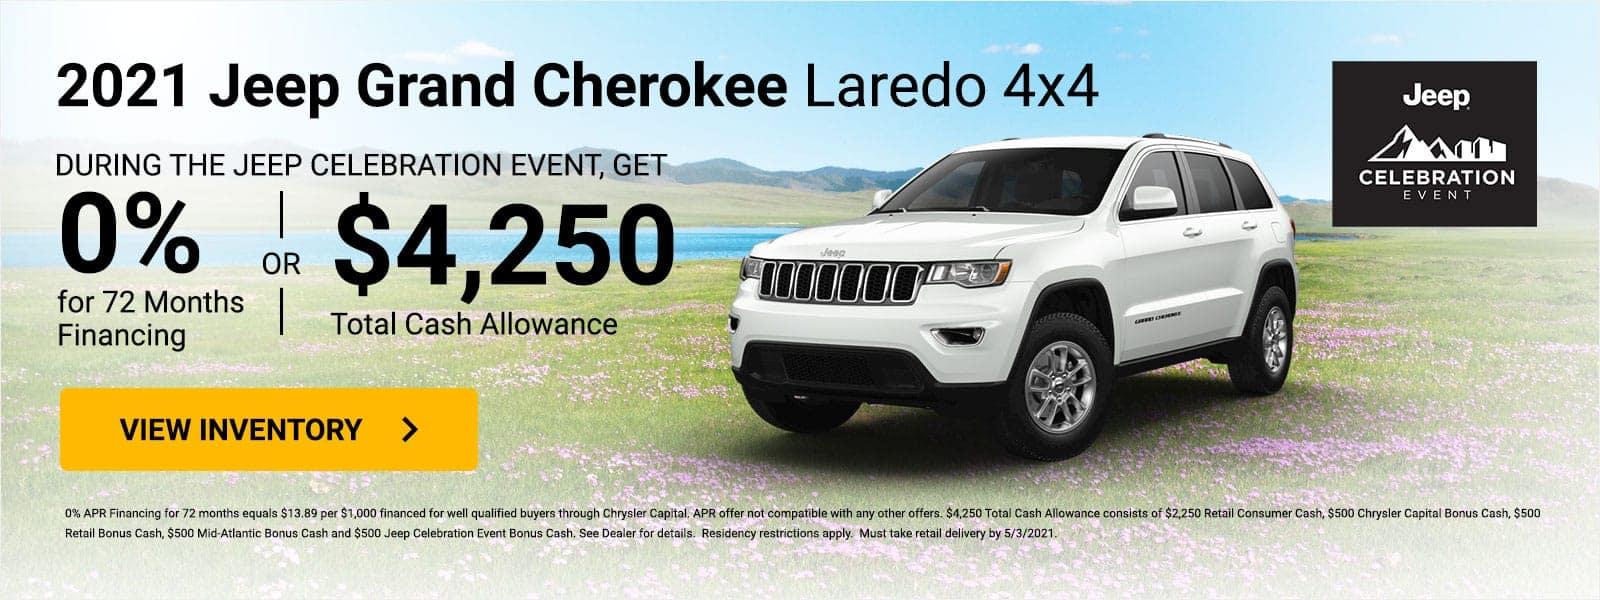 [MD-VA-WV-WASHDC] 21-jeep-grand-cherokee